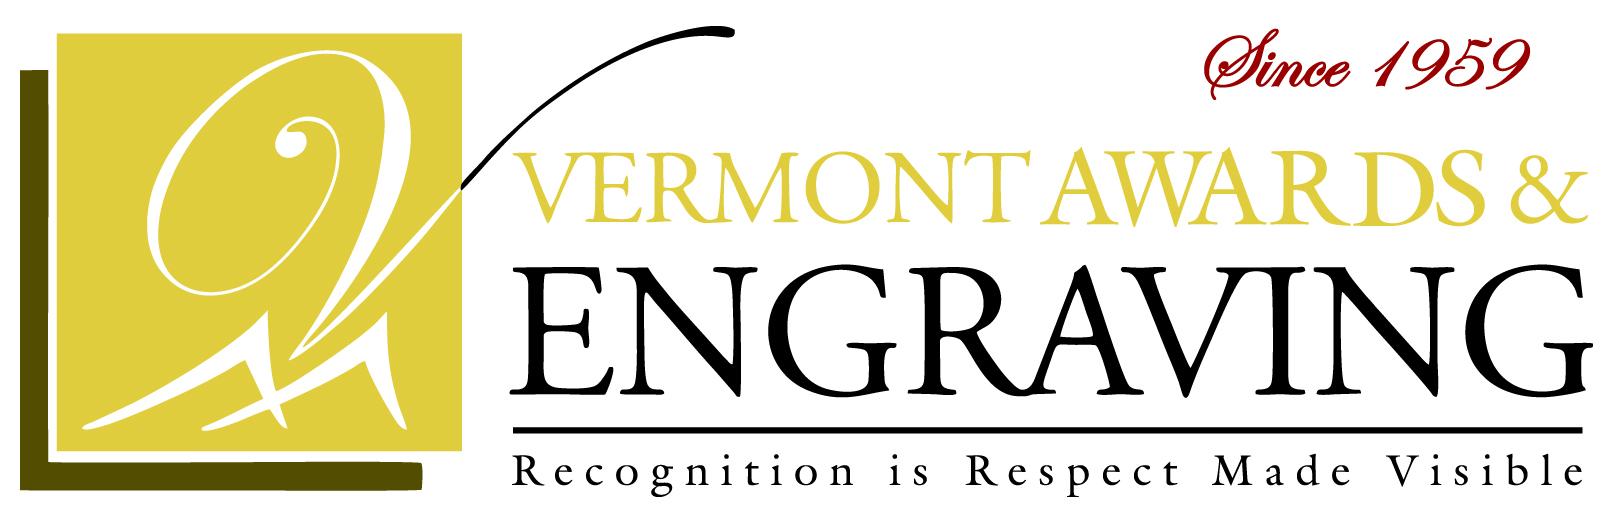 Vermont Awards & Engraving Logo